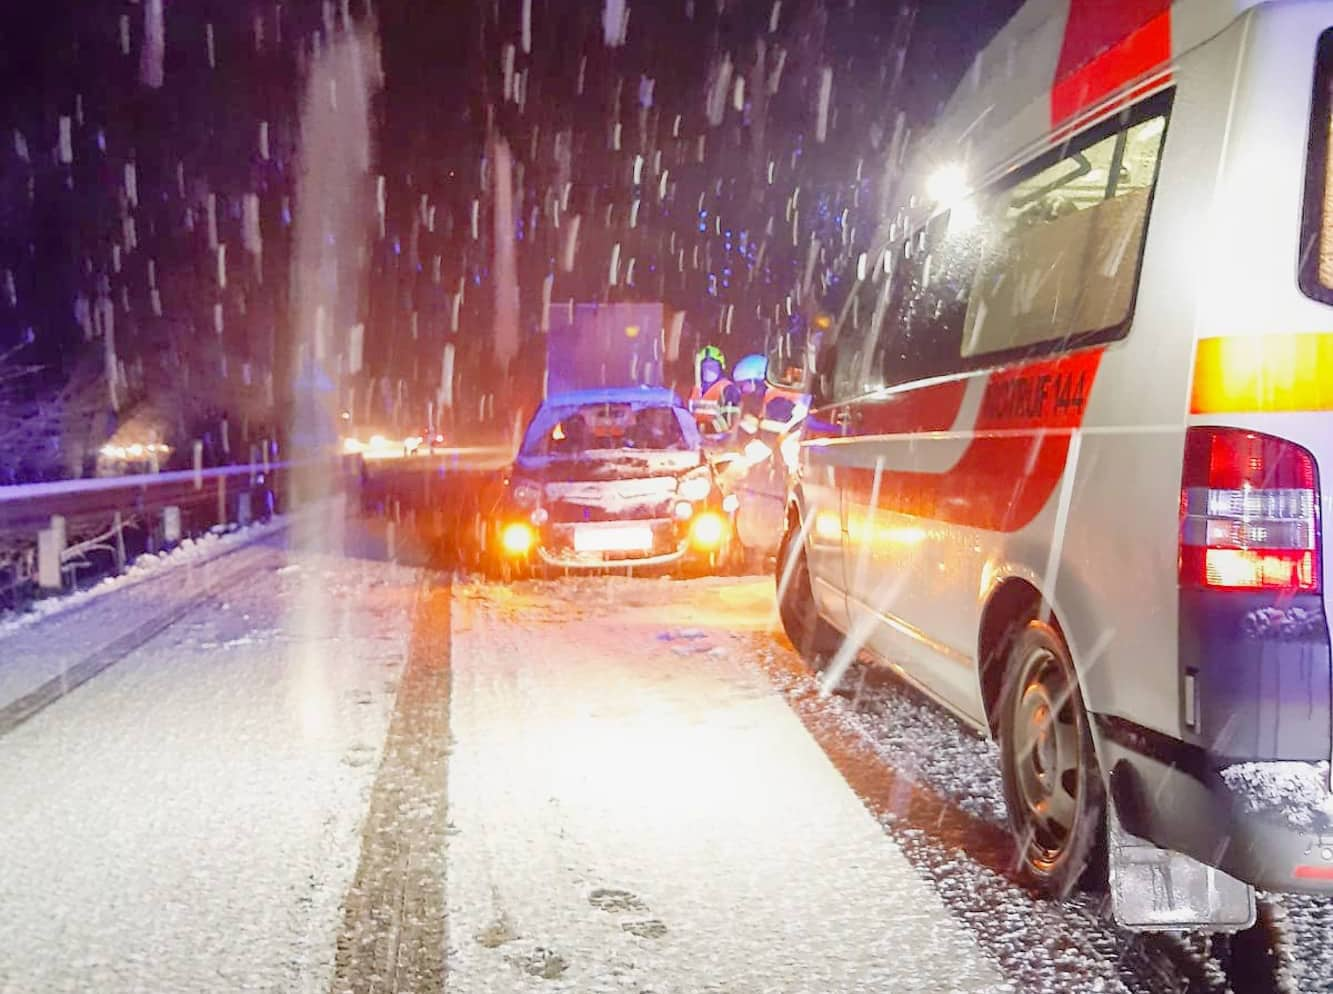 Verkehrsunfall - LKW touchierte PKW